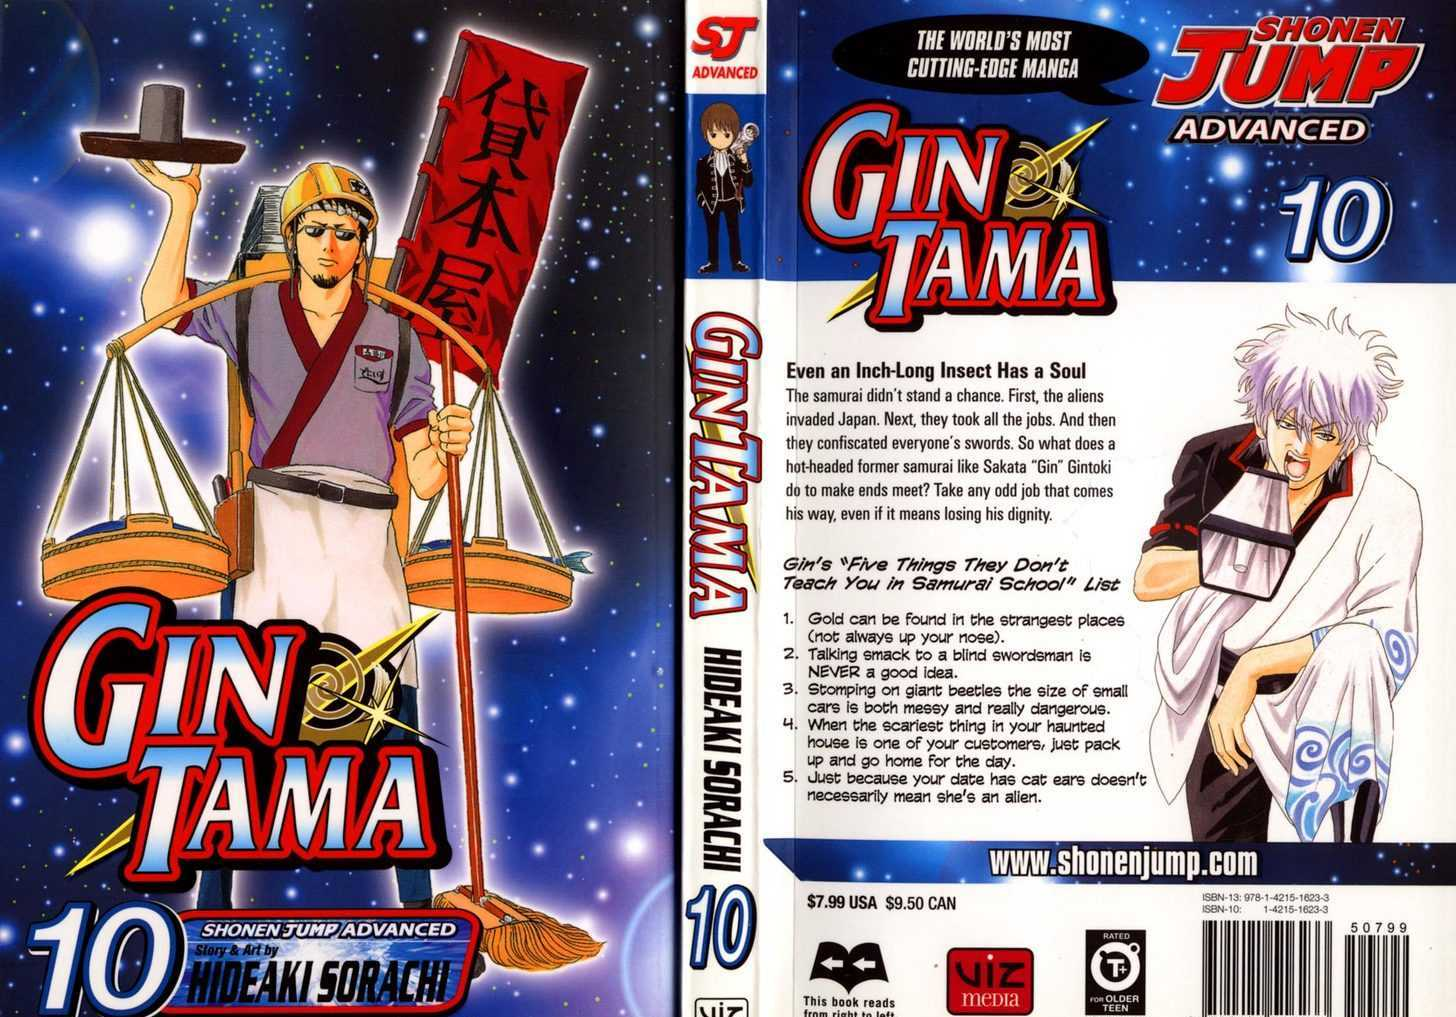 https://im.nineanime.com/comics/pic9/18/210/16361/Gintama770155.jpg Page 1